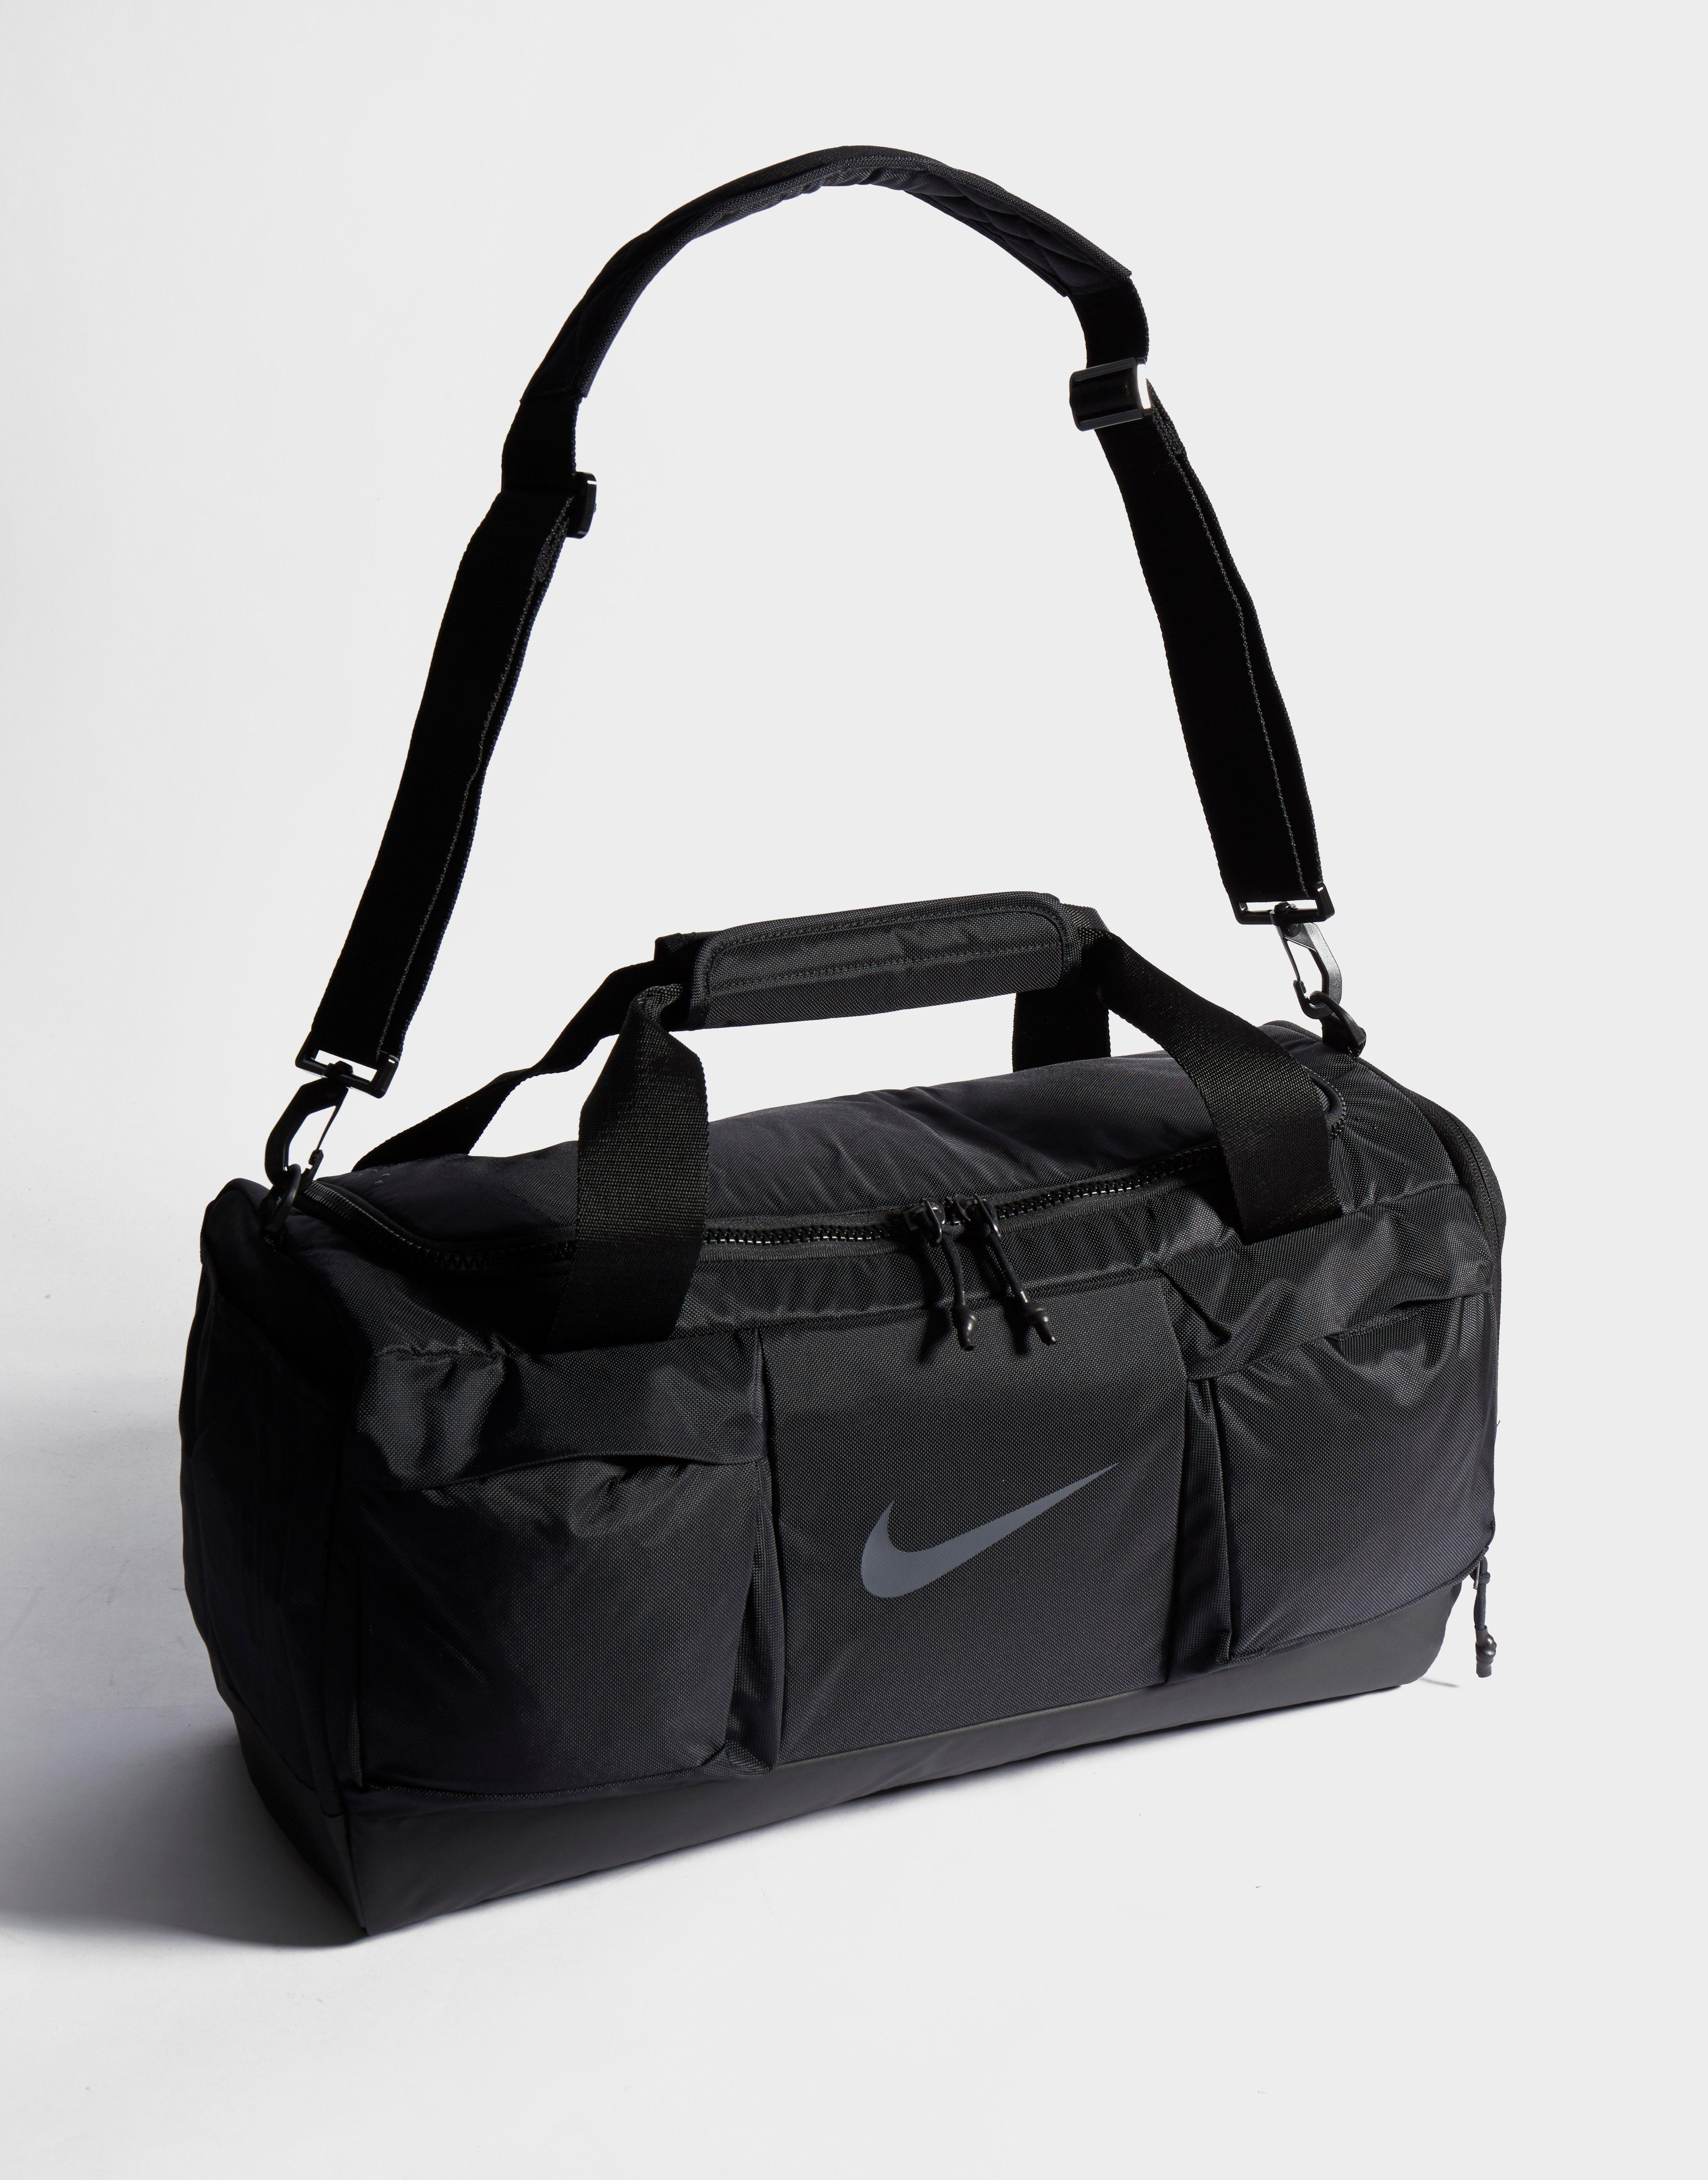 4db045c2880 Cheap JD Sports Australia Store products online Australia